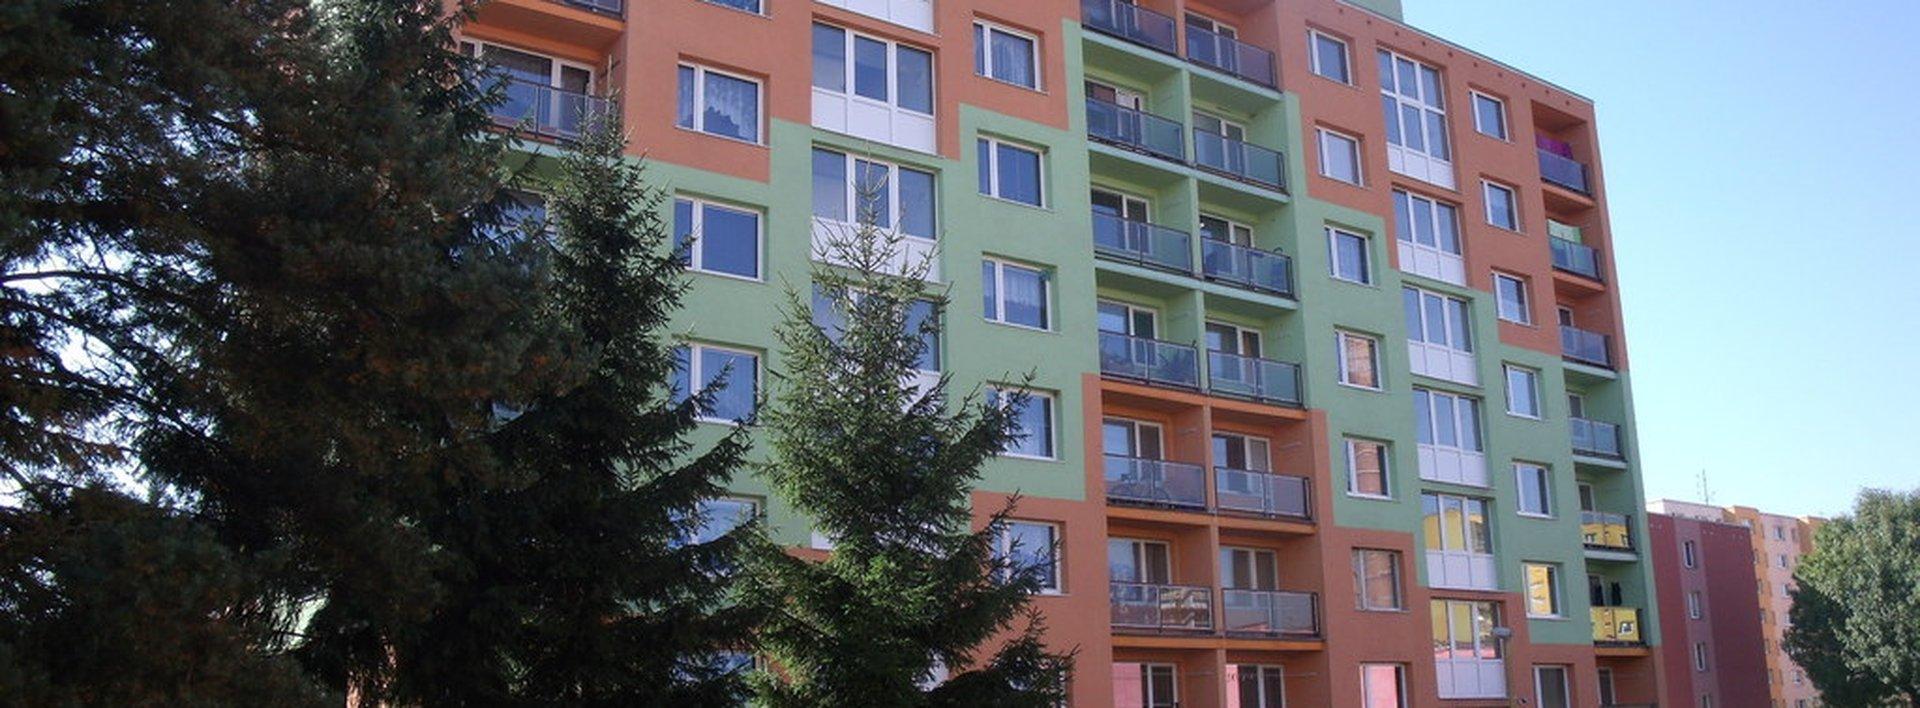 Prodej prostorného bytu 2+1/L v OV, Stráž pod Ralskem, Ev.č.: N47455